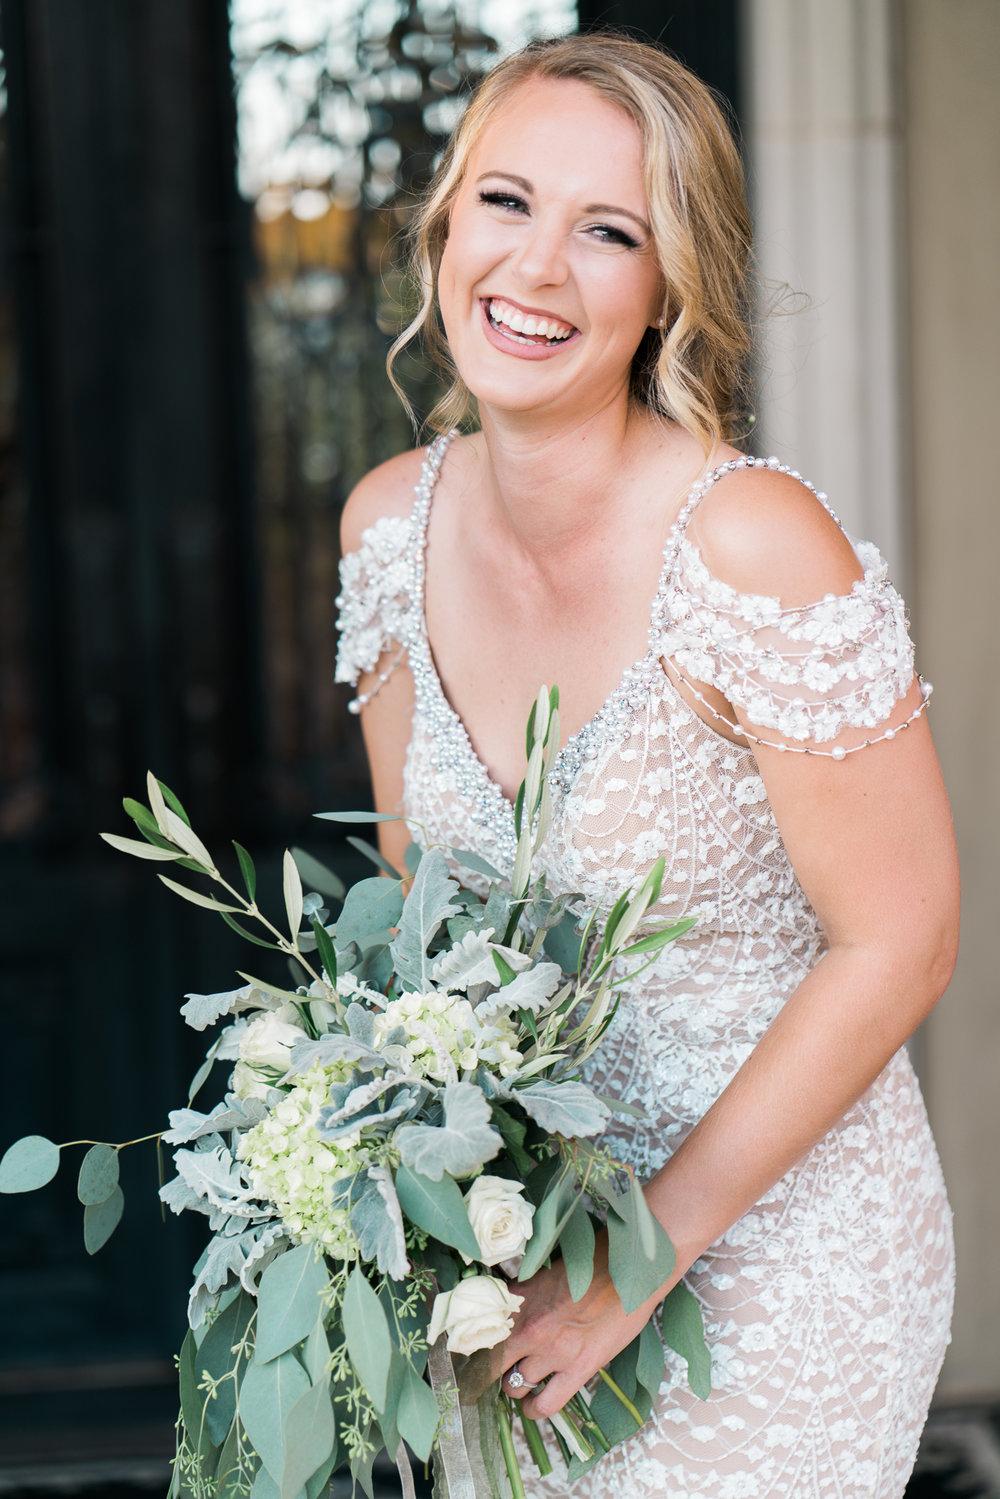 Clytee-Bridal-Portraits-Web-8.jpg